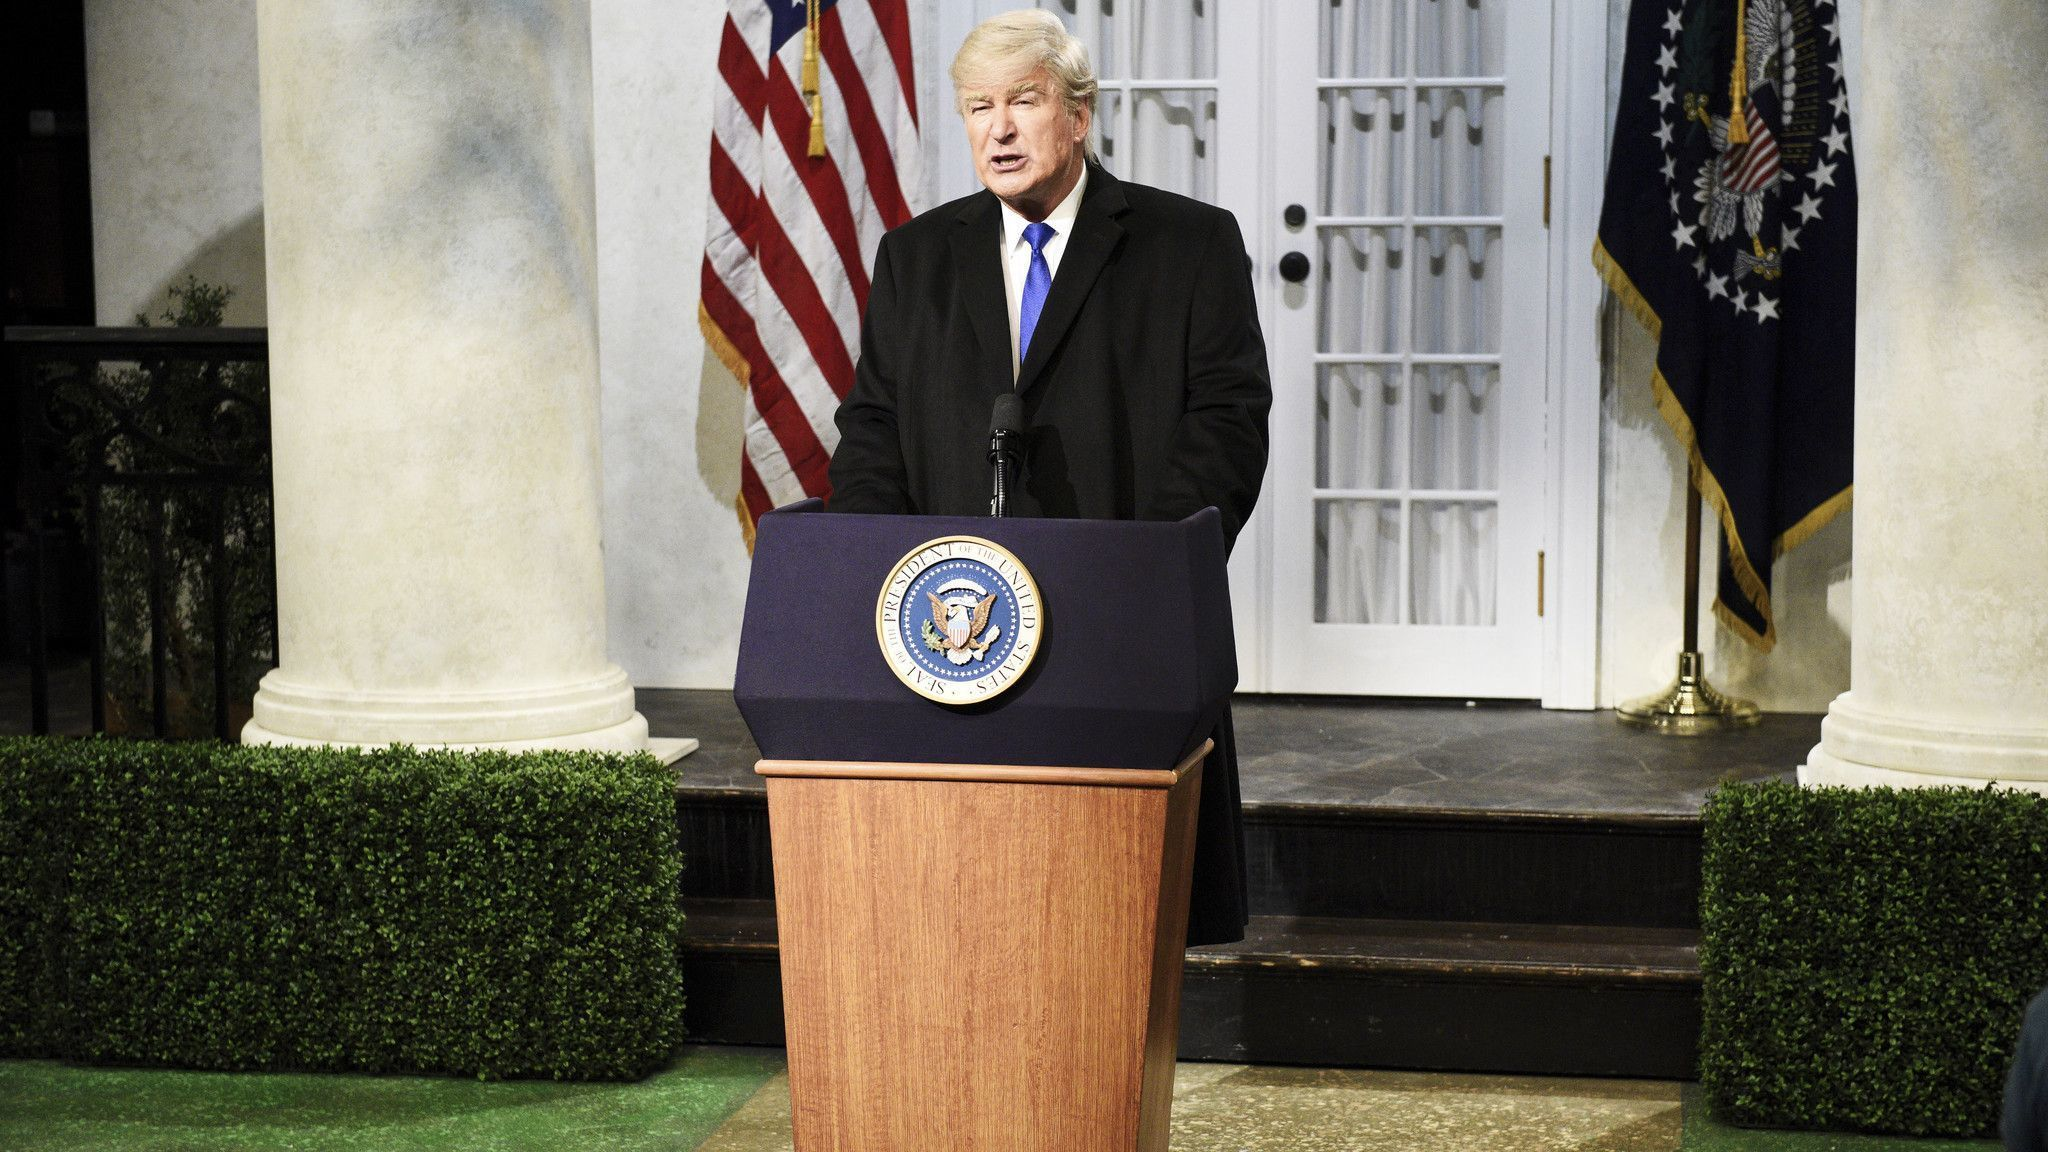 'SNL' asks: Is real Trump or fake Trump funnier?